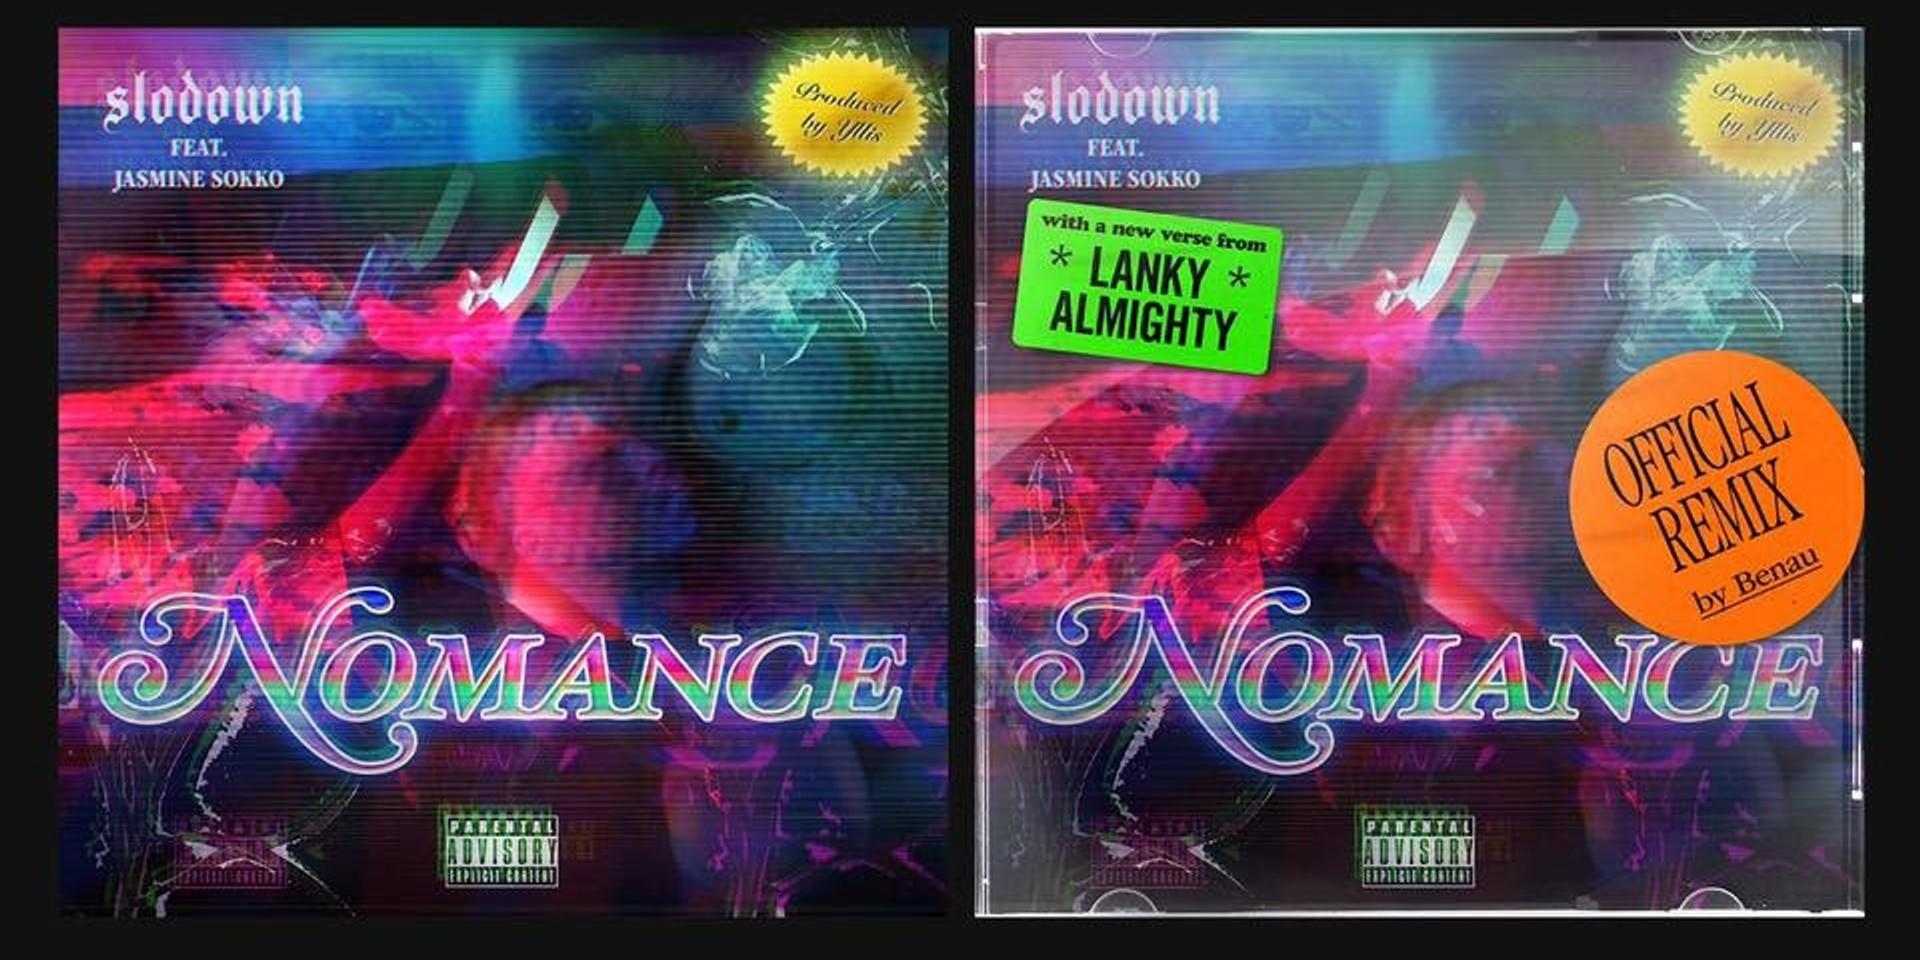 LISTEN: Toronto beatsmith Benau & NYC rapper Lanky Almighty remix Slodown & Jasmine Sokko's 'Nomance'